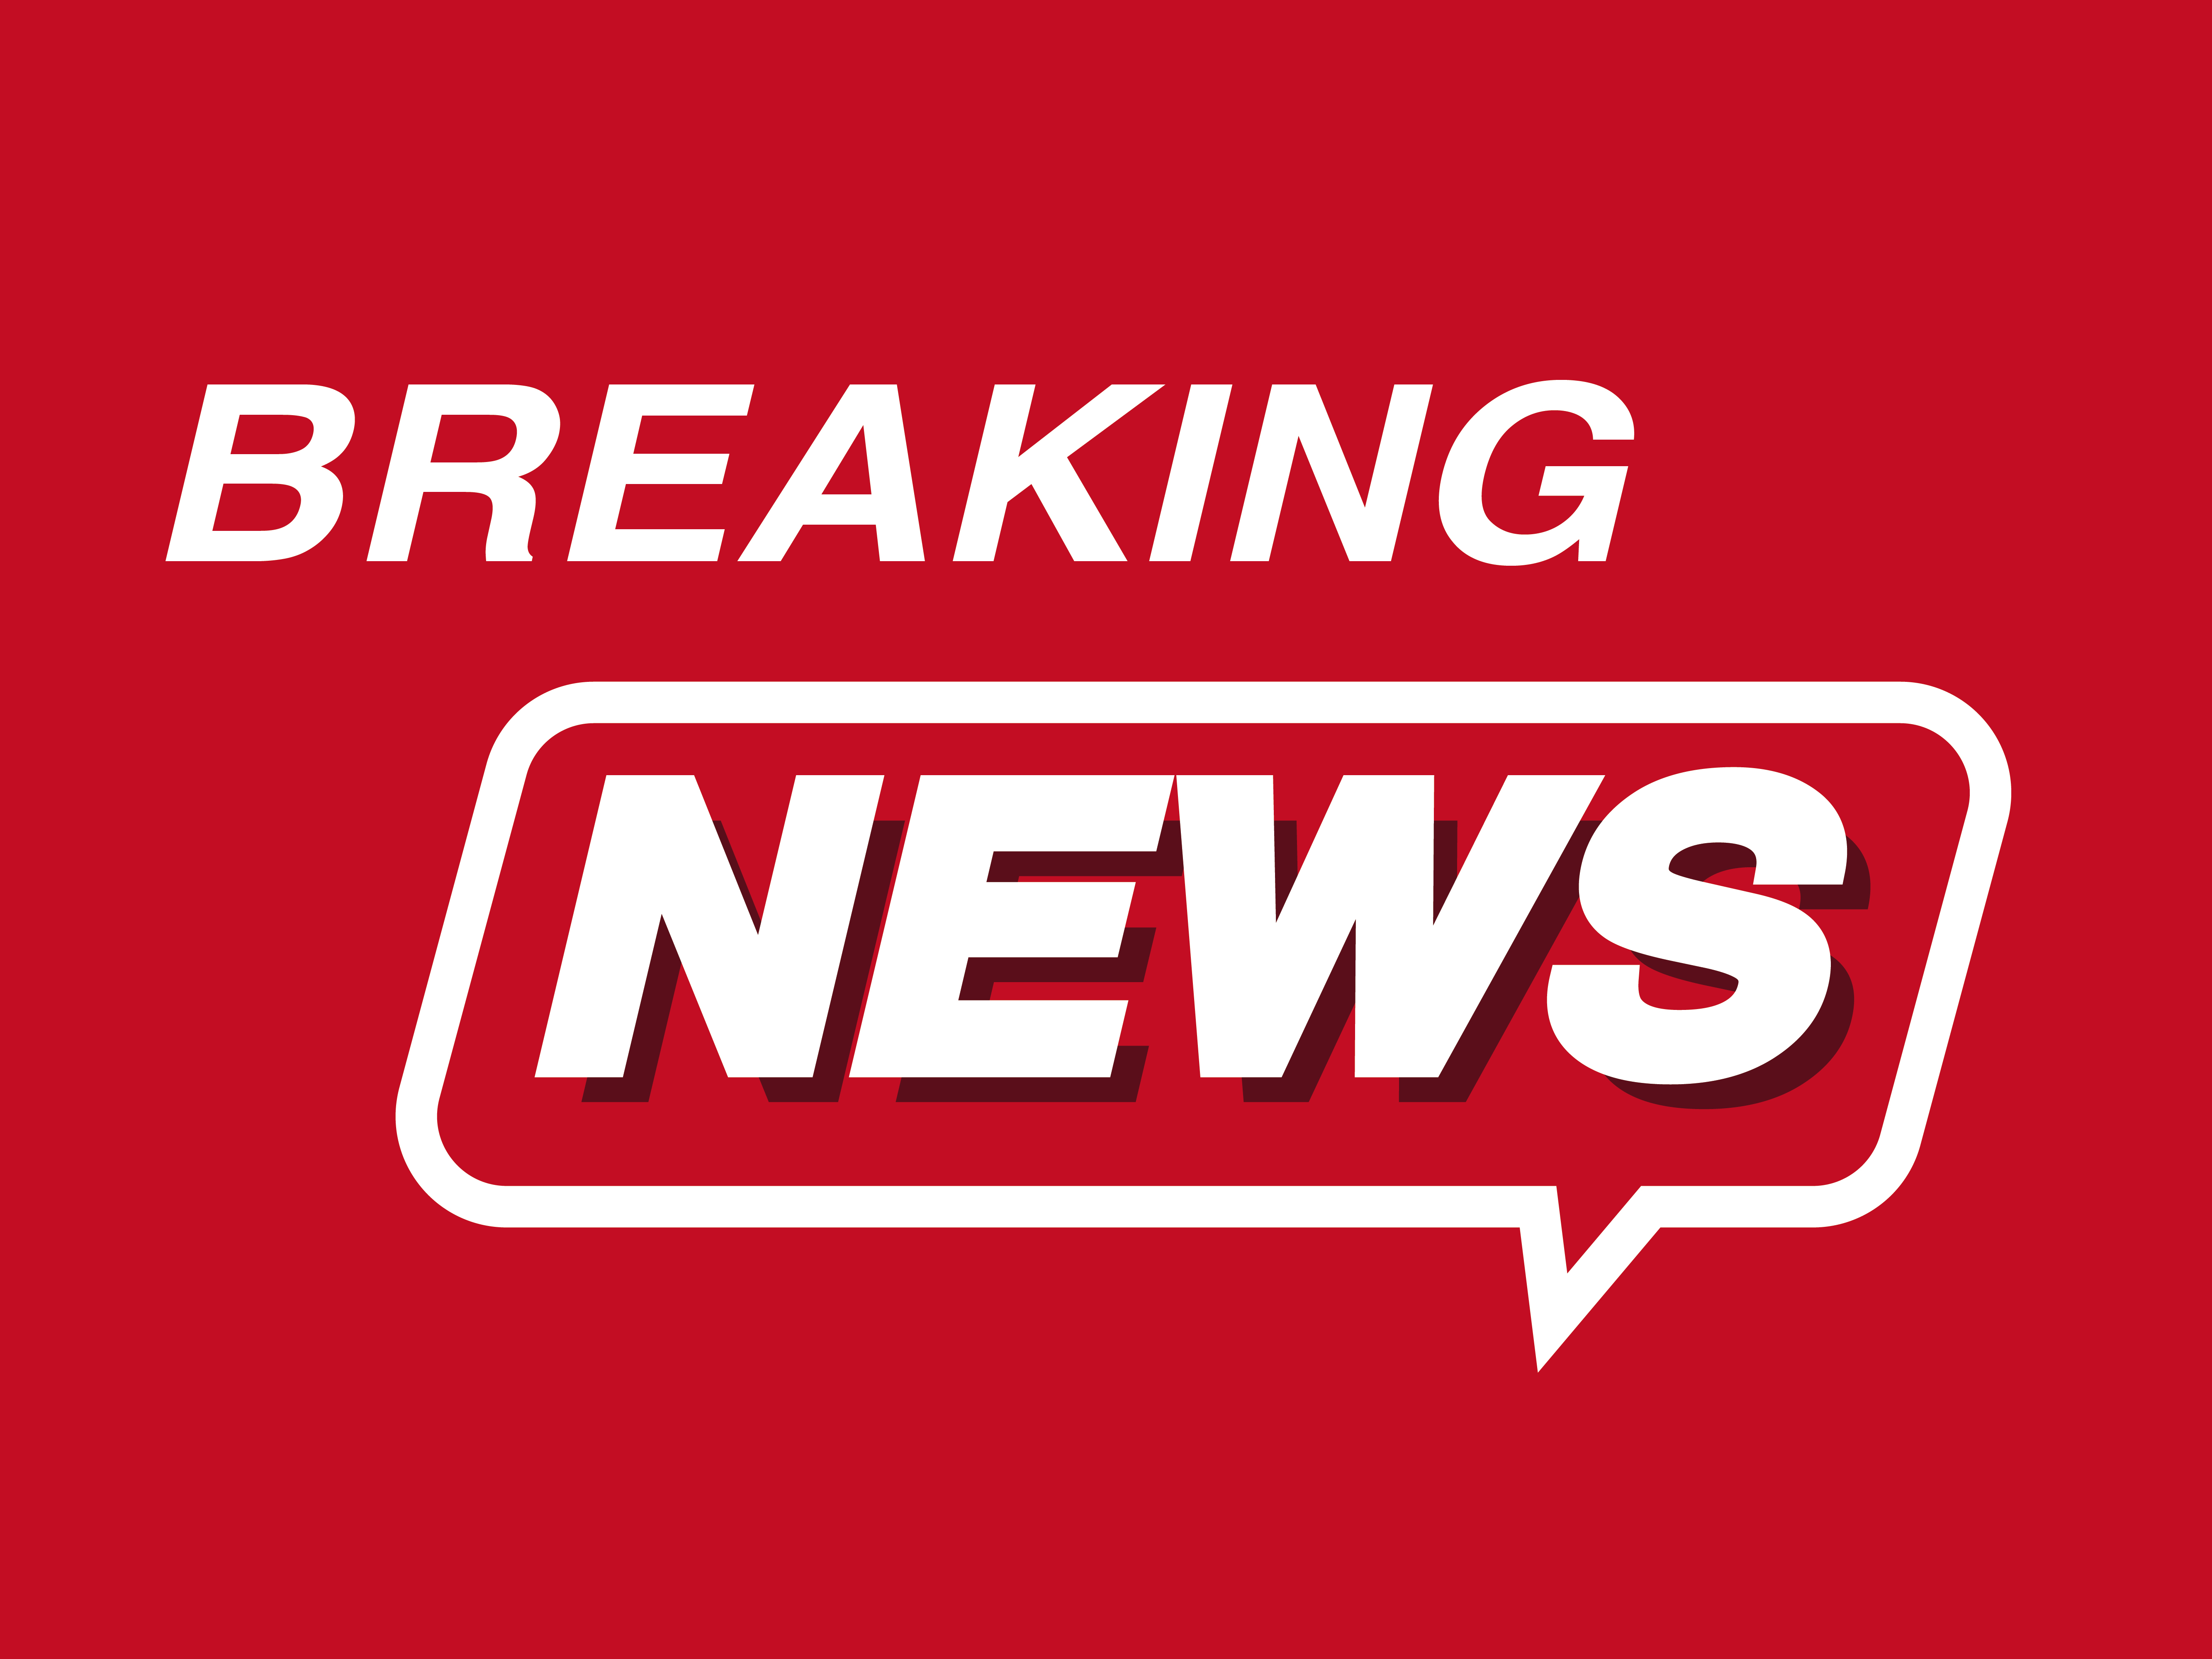 5.0-magnitude quake hits 5km ENE of Indian Hills, Nevada: USGS